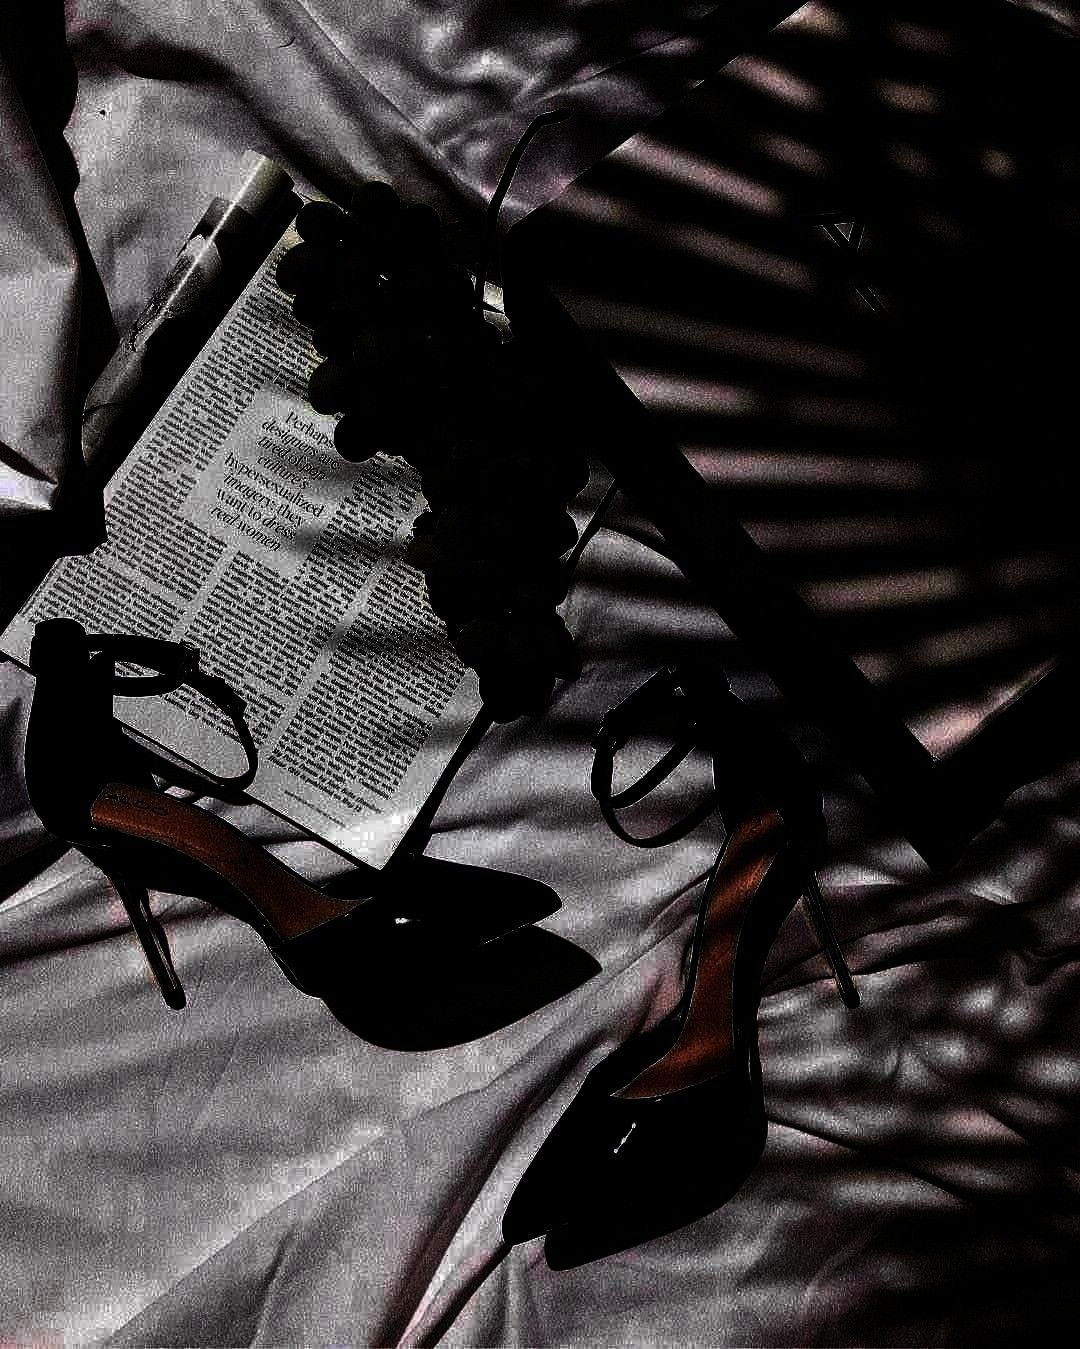 Source by rasha1saad shoesSummer feel       Source by rasha1saad shoes Michael Kors Shoes  Michael Kors Leather Pumps  Color Black  Size 10 Shoemint Shoes  Black Heels Wi...